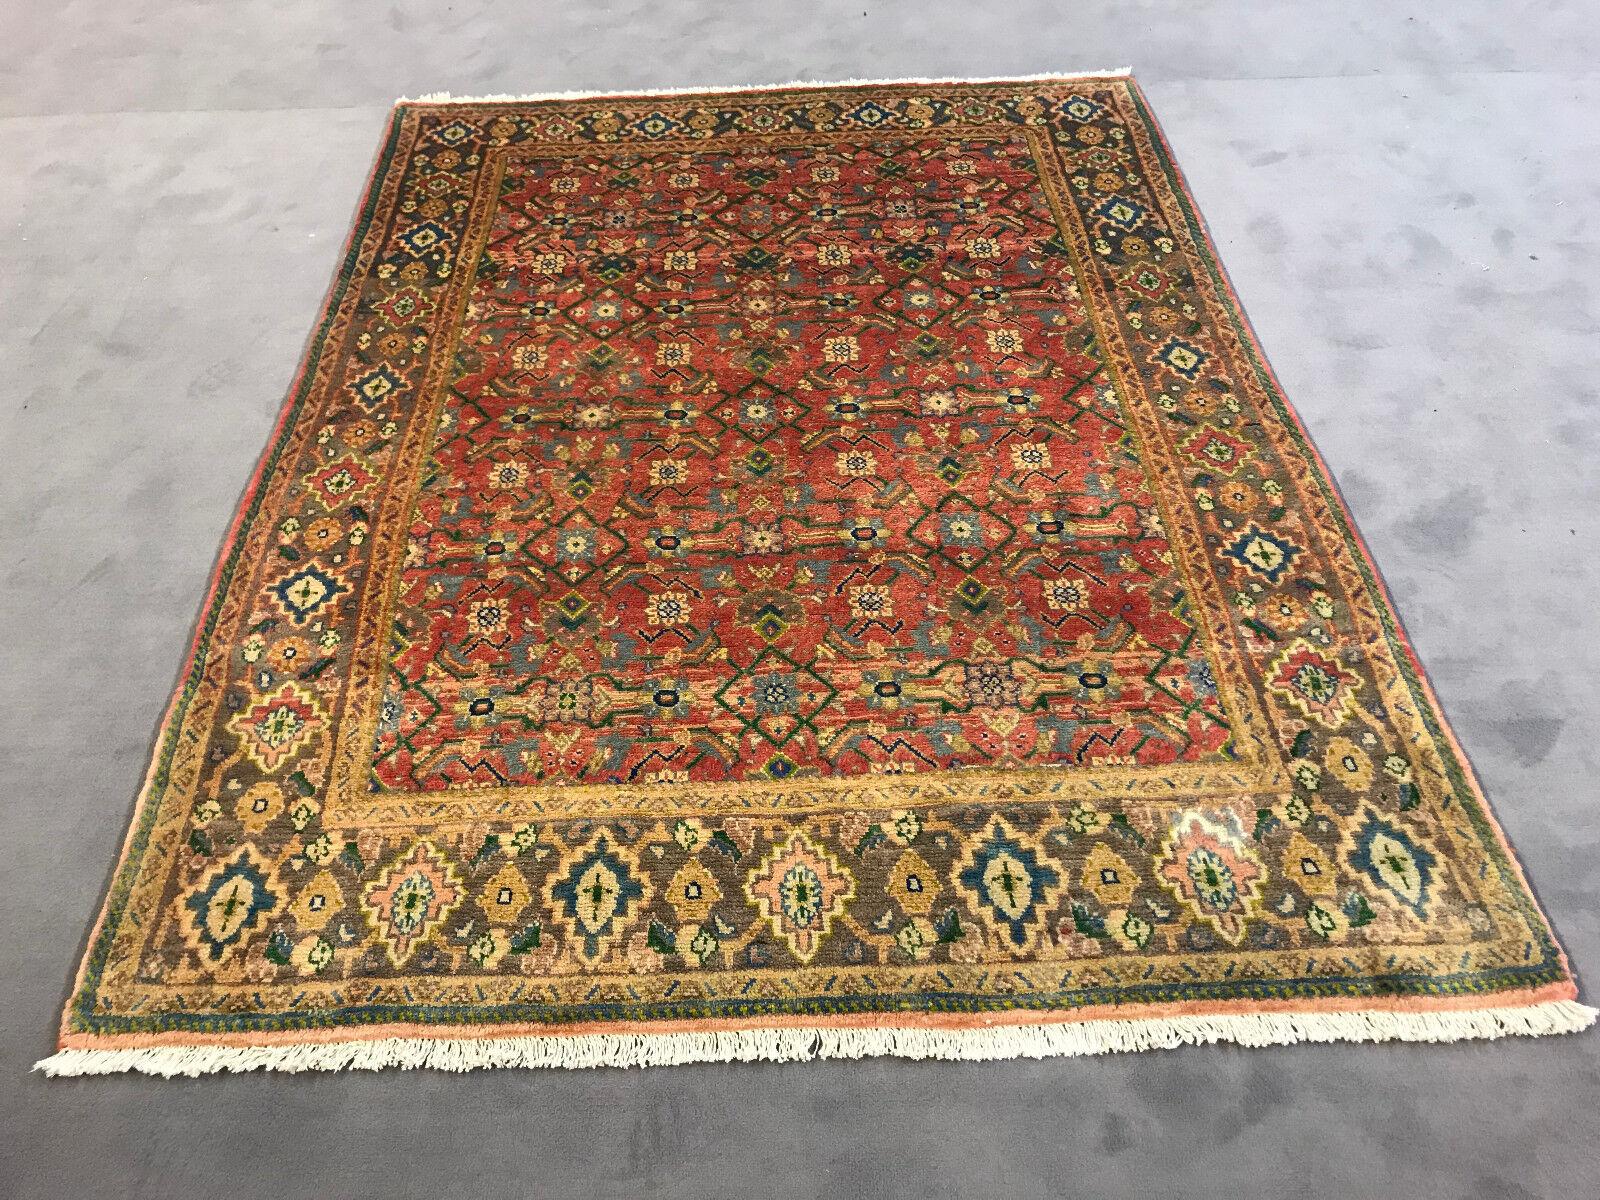 Wiss Orient alfombra persa alfombra 2,16x1,59 m  exclusiva de arte del suelo  nuevo